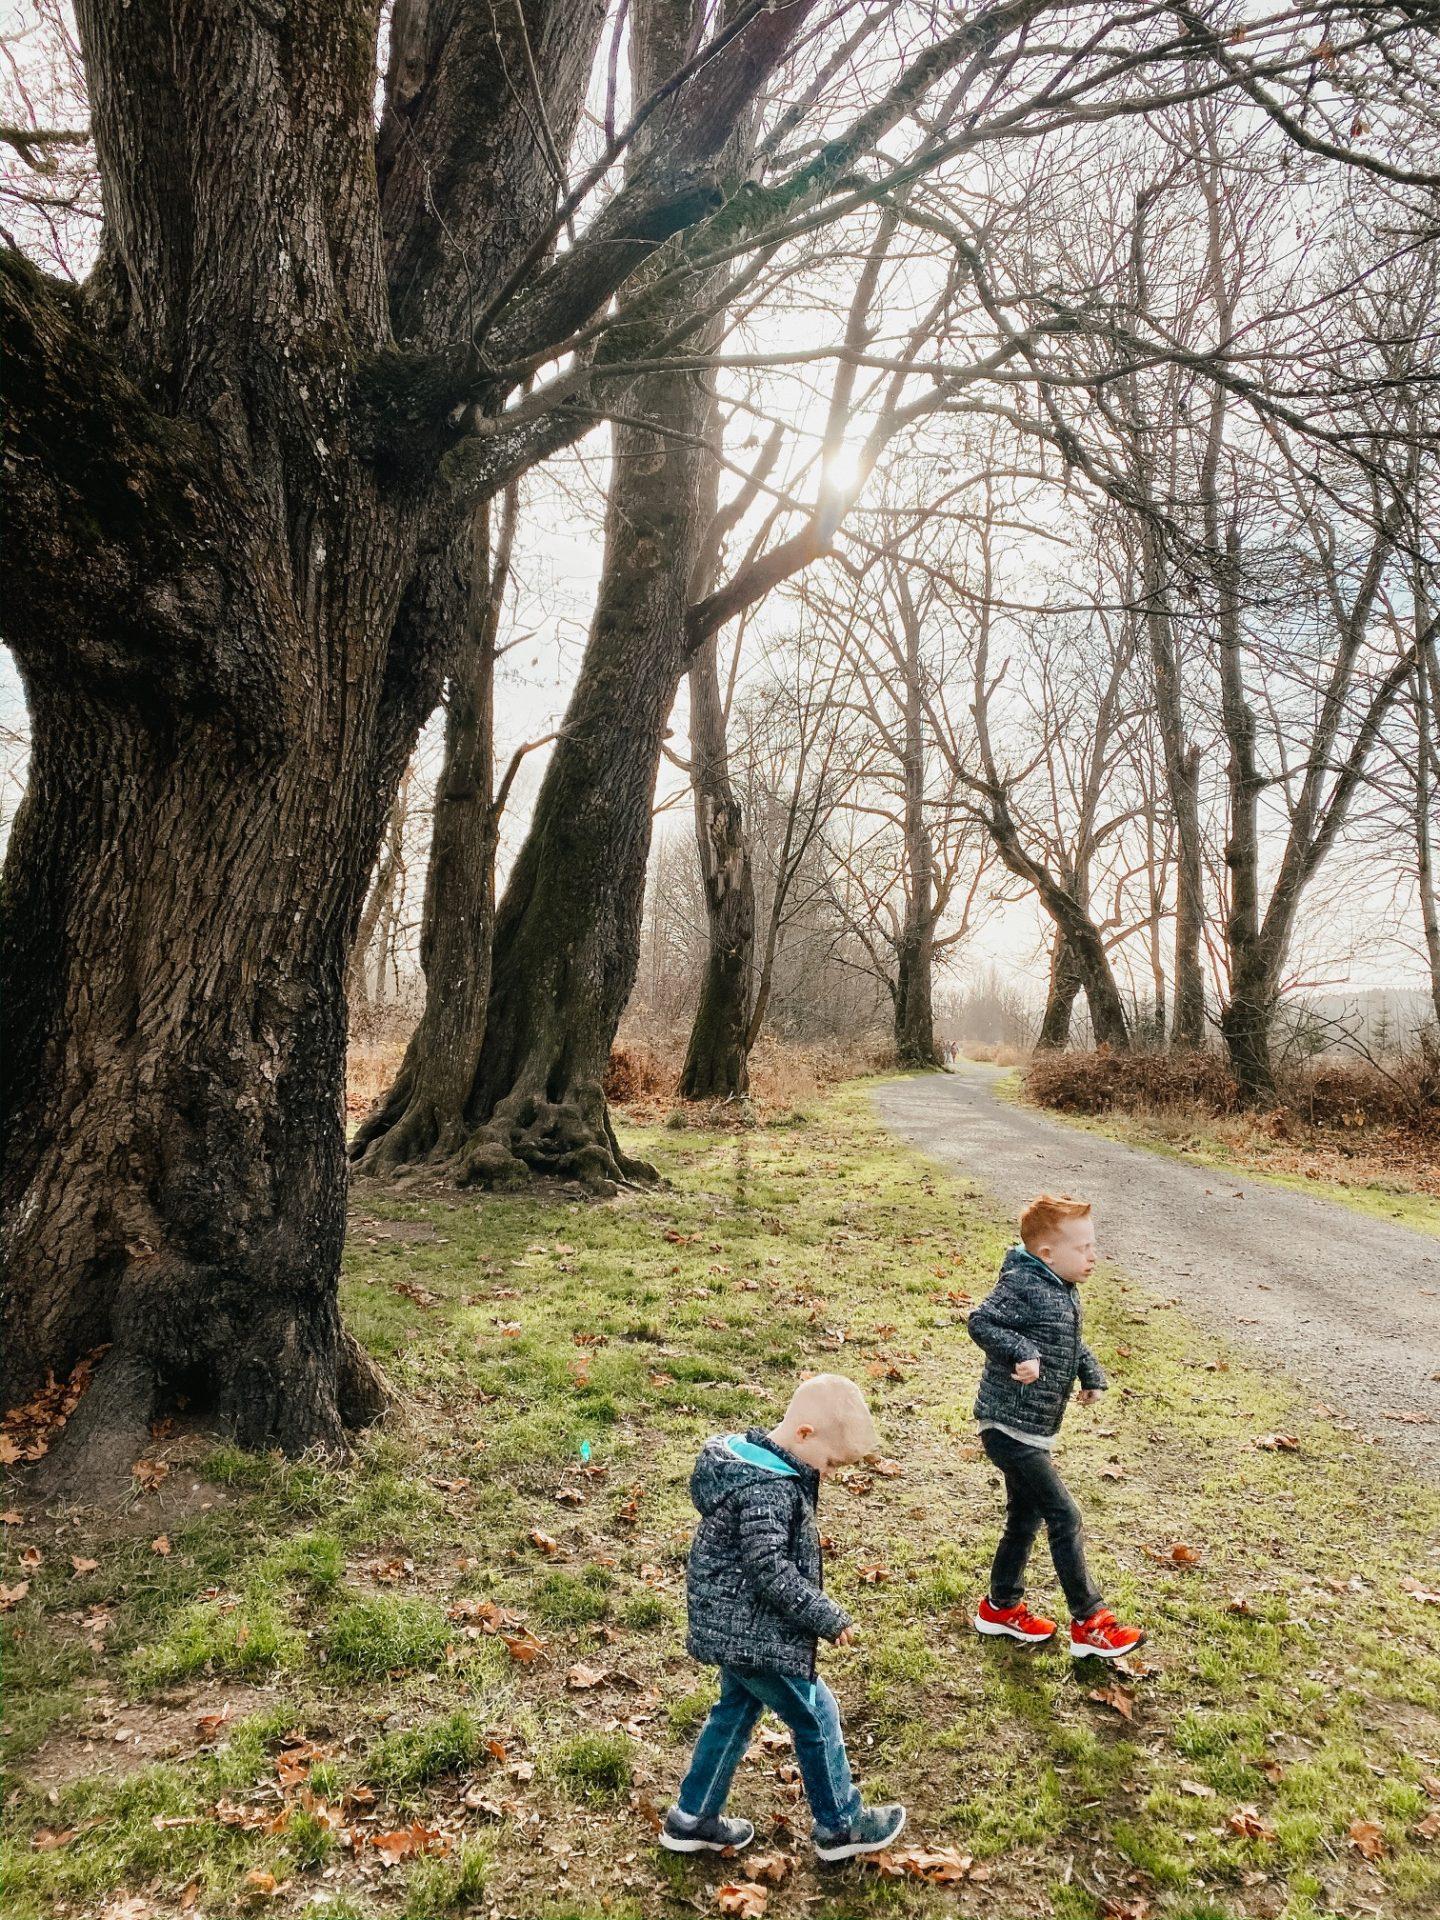 Nisqually Wildlife walking paths